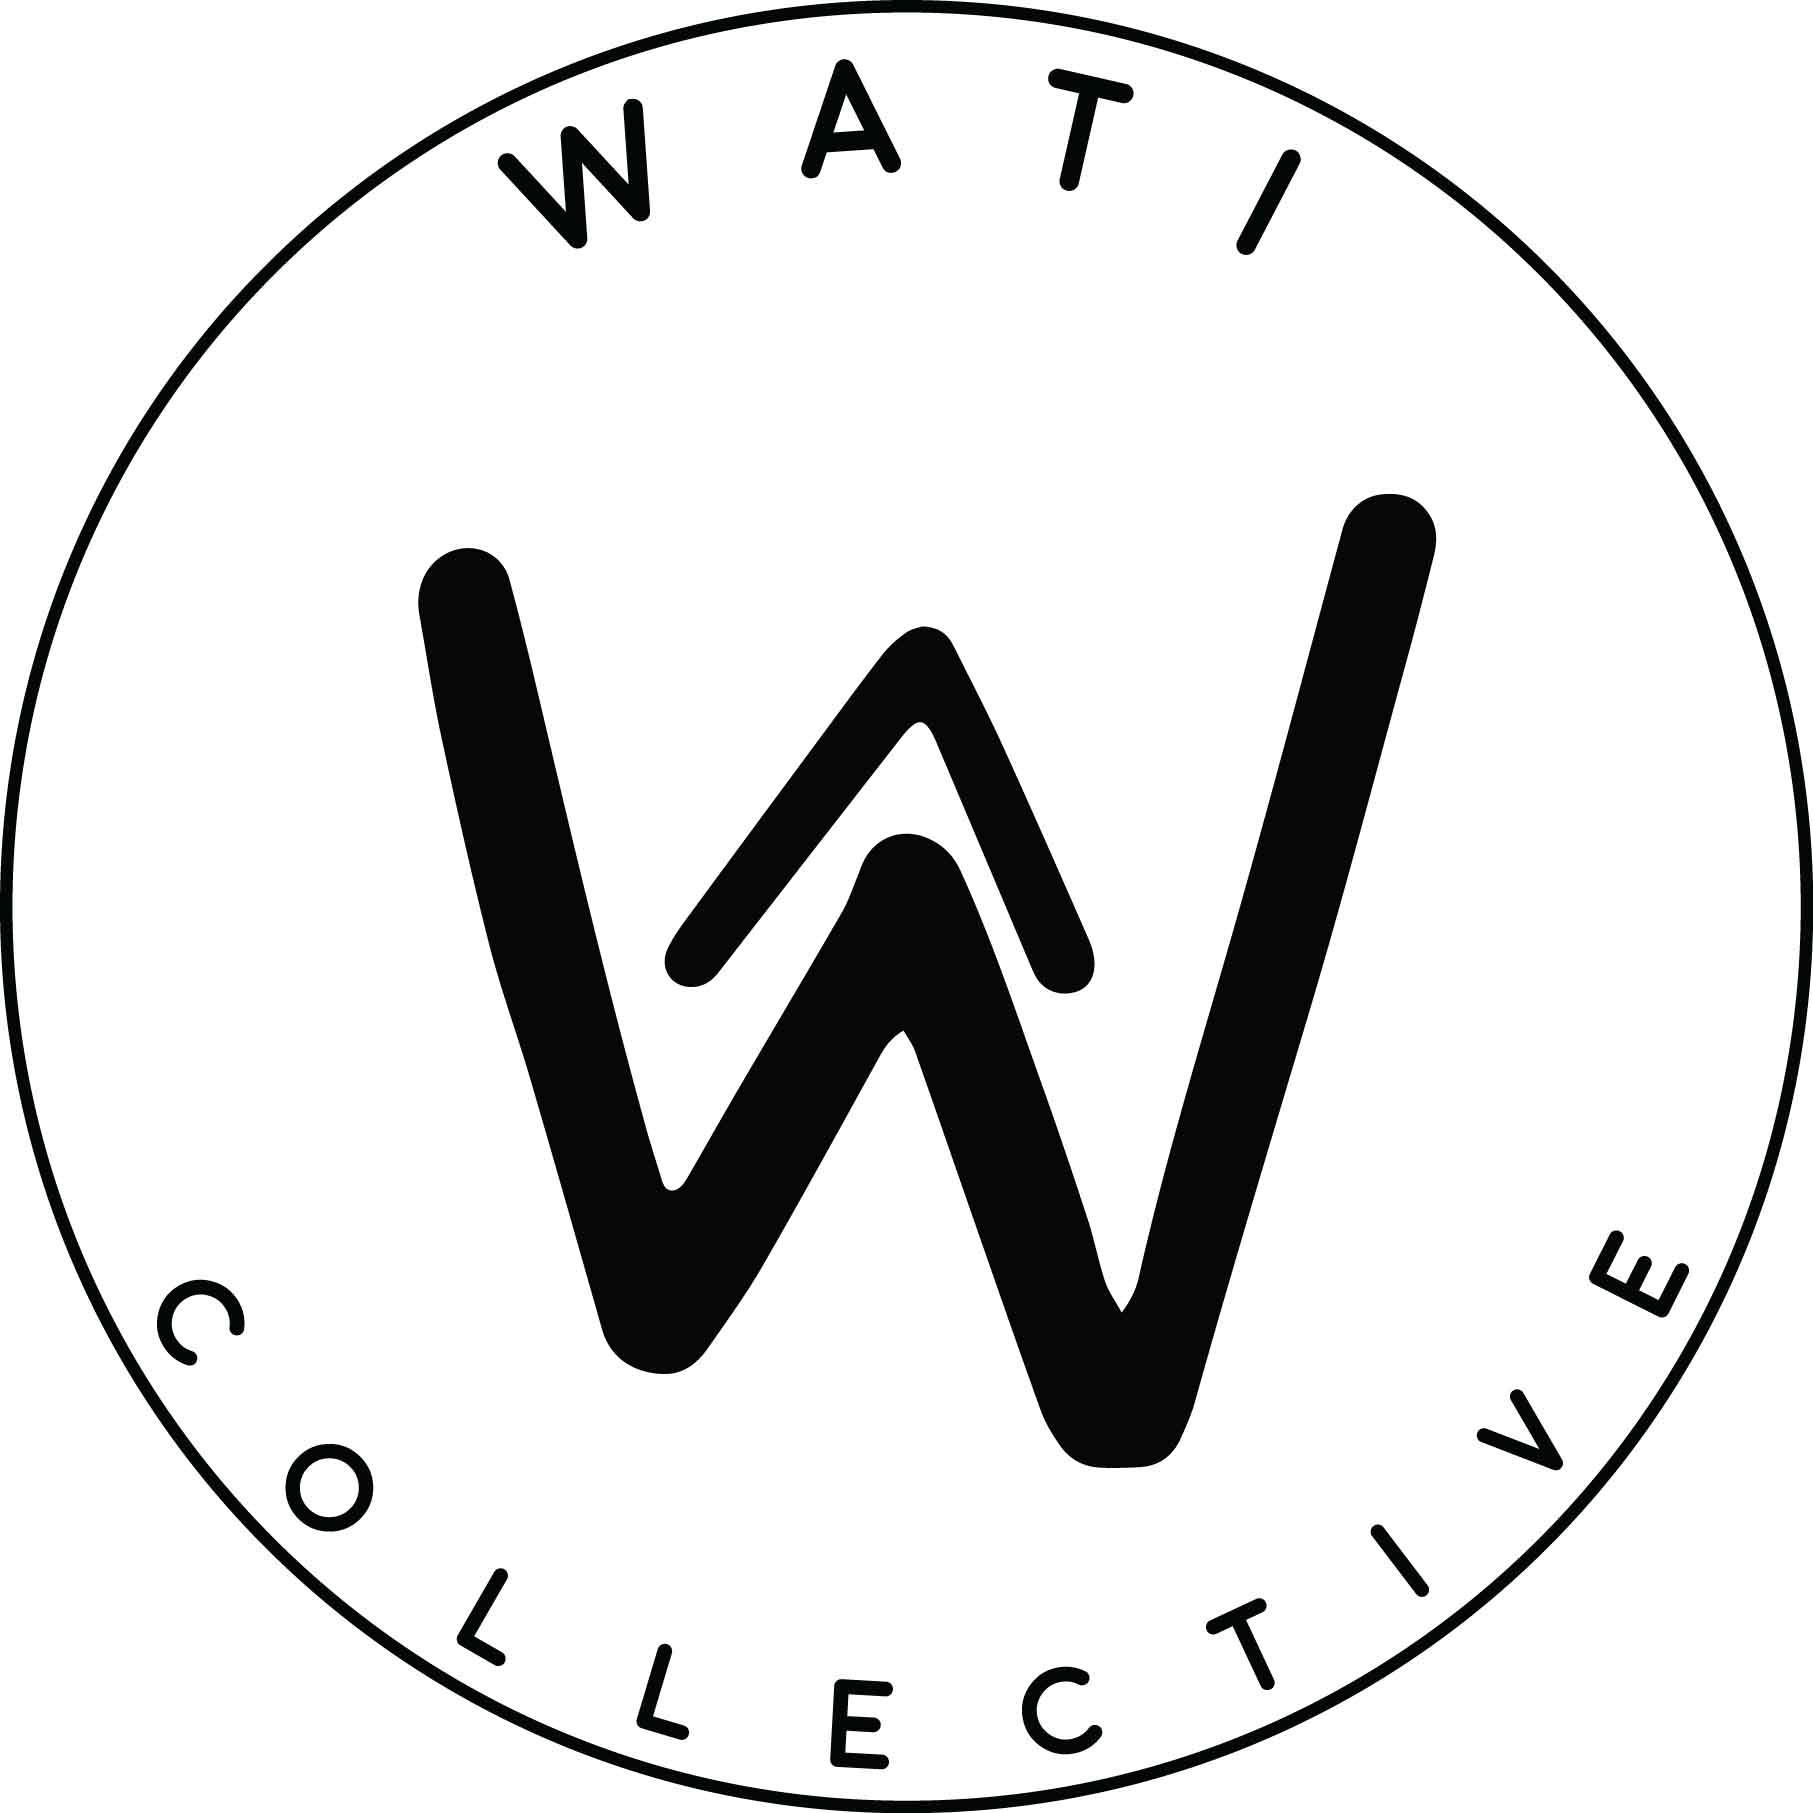 Wati_logo_3_small.jpg